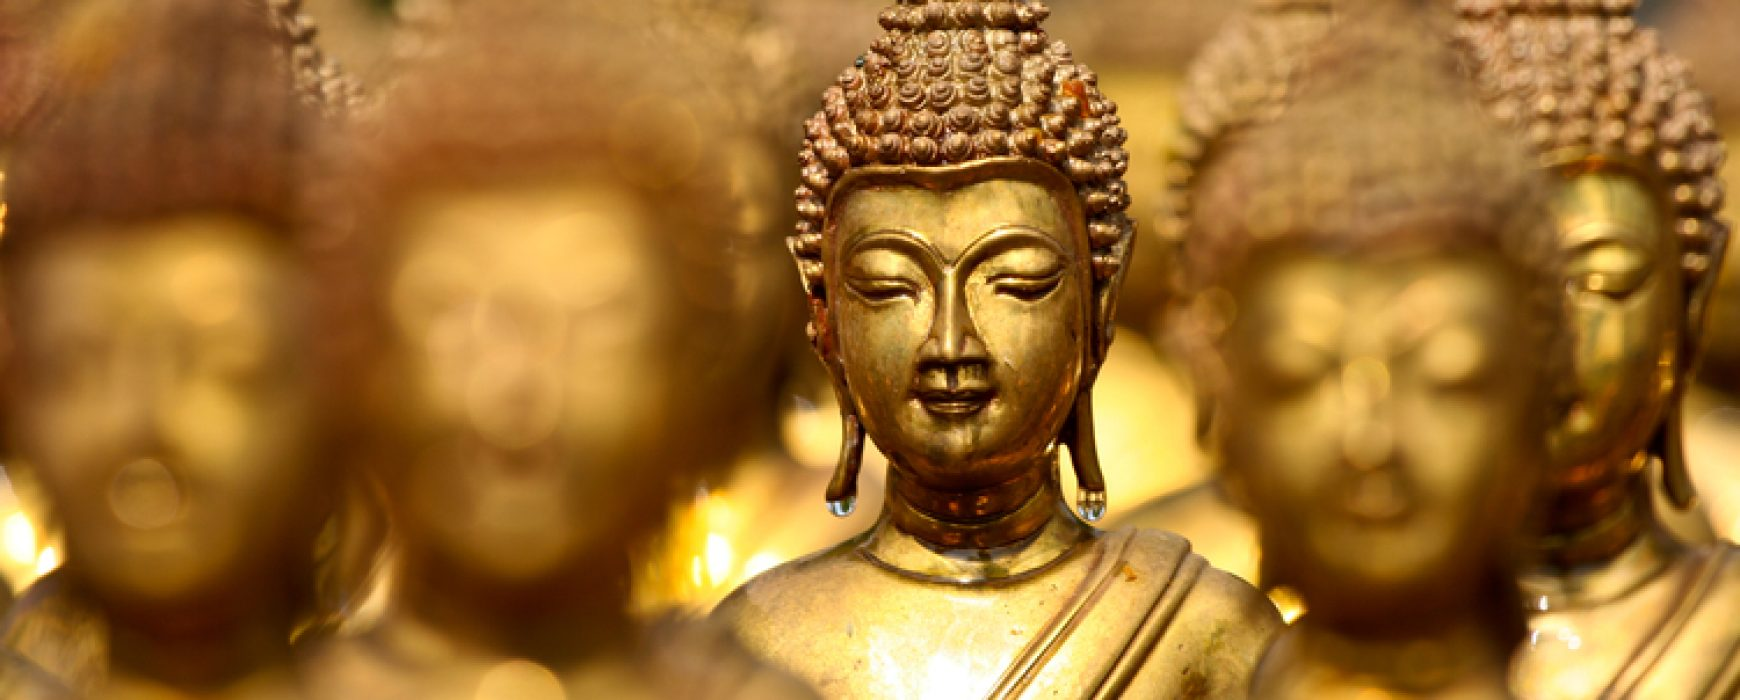 New Center for Buddhist Studies at the University of Arizona